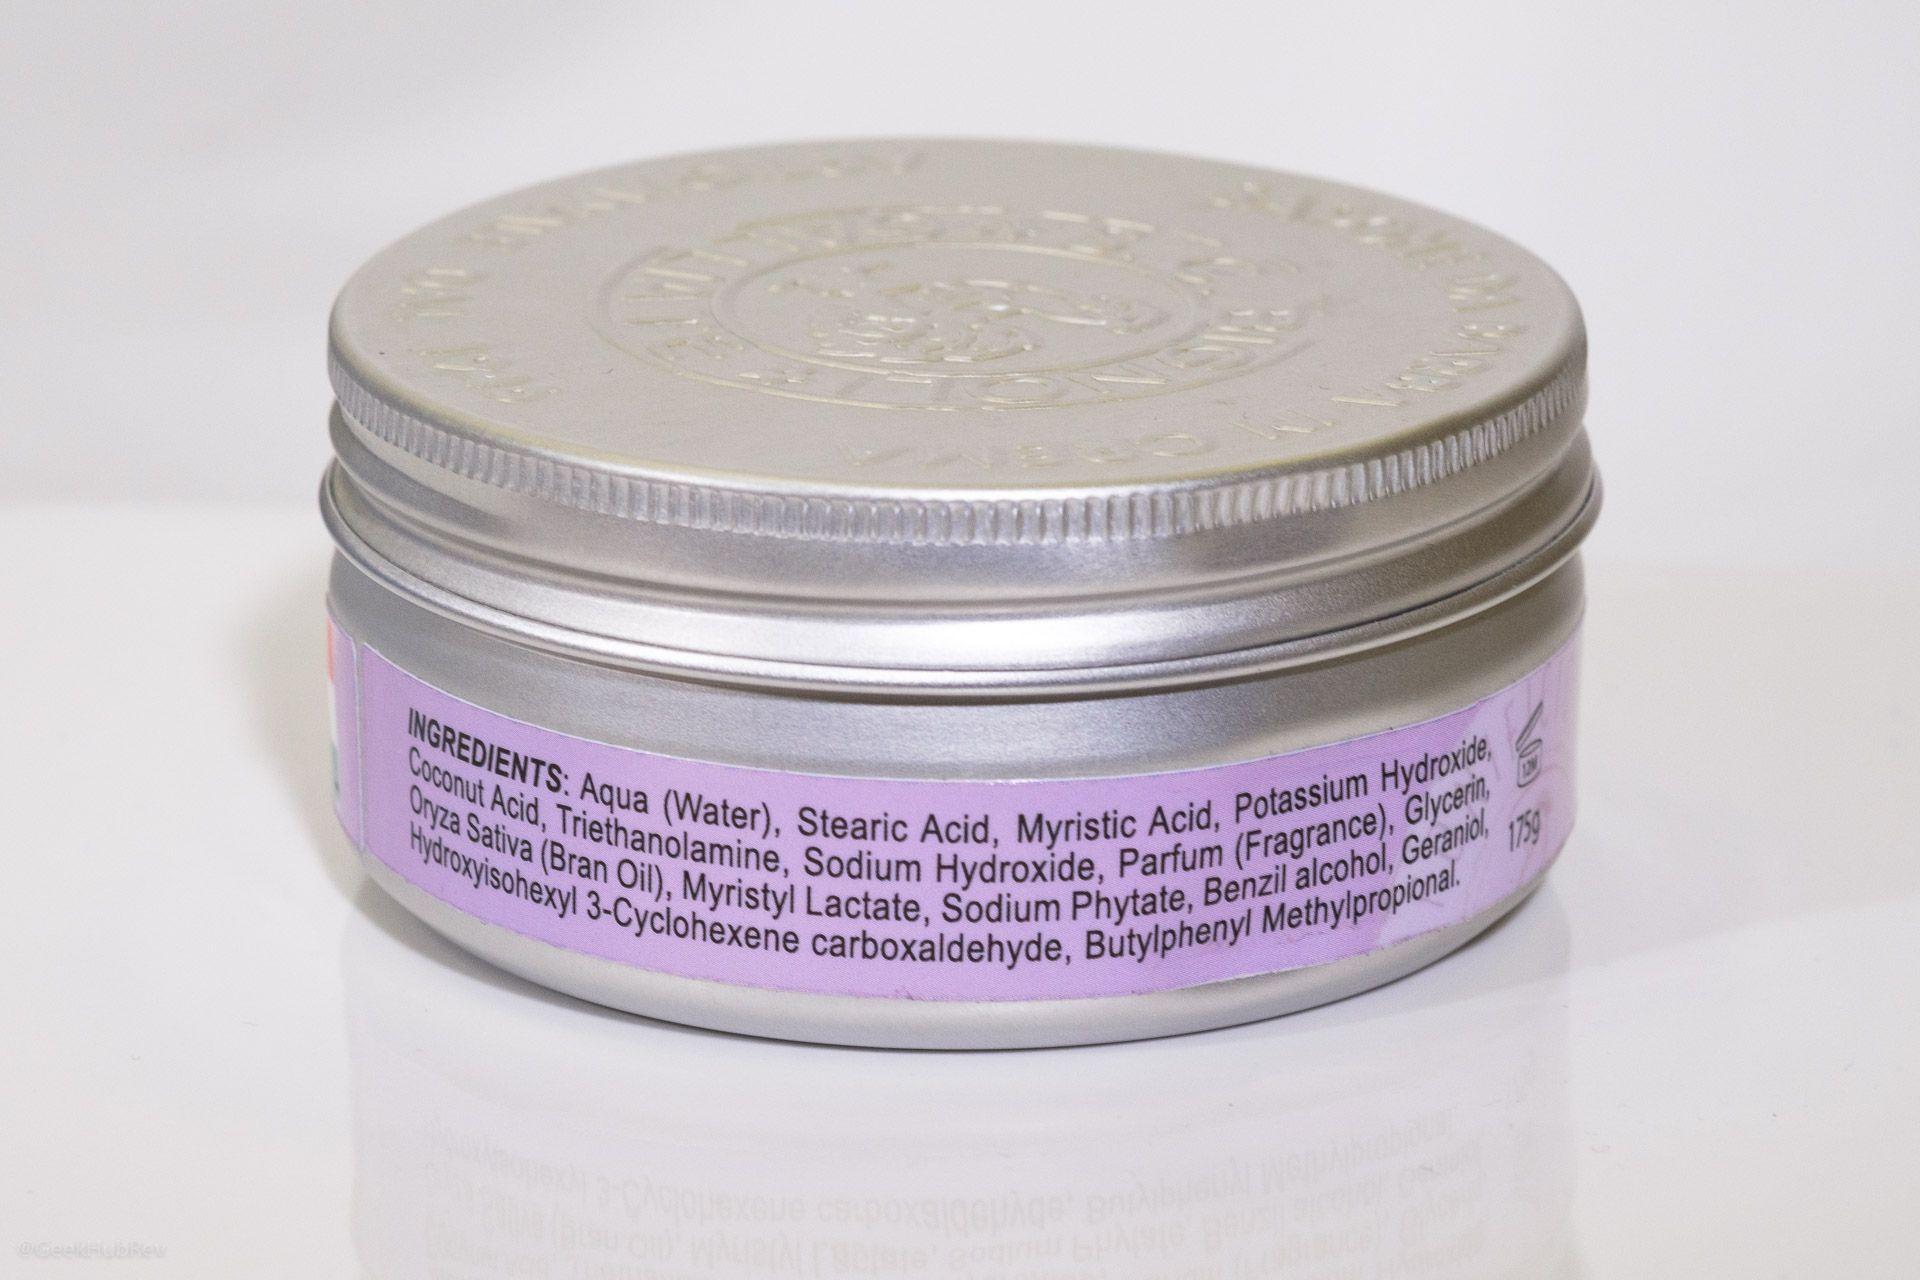 Skład kremu do golenia Saponificio Bignoli Violetta di Parma Shaving Cream (INCI ingredients)